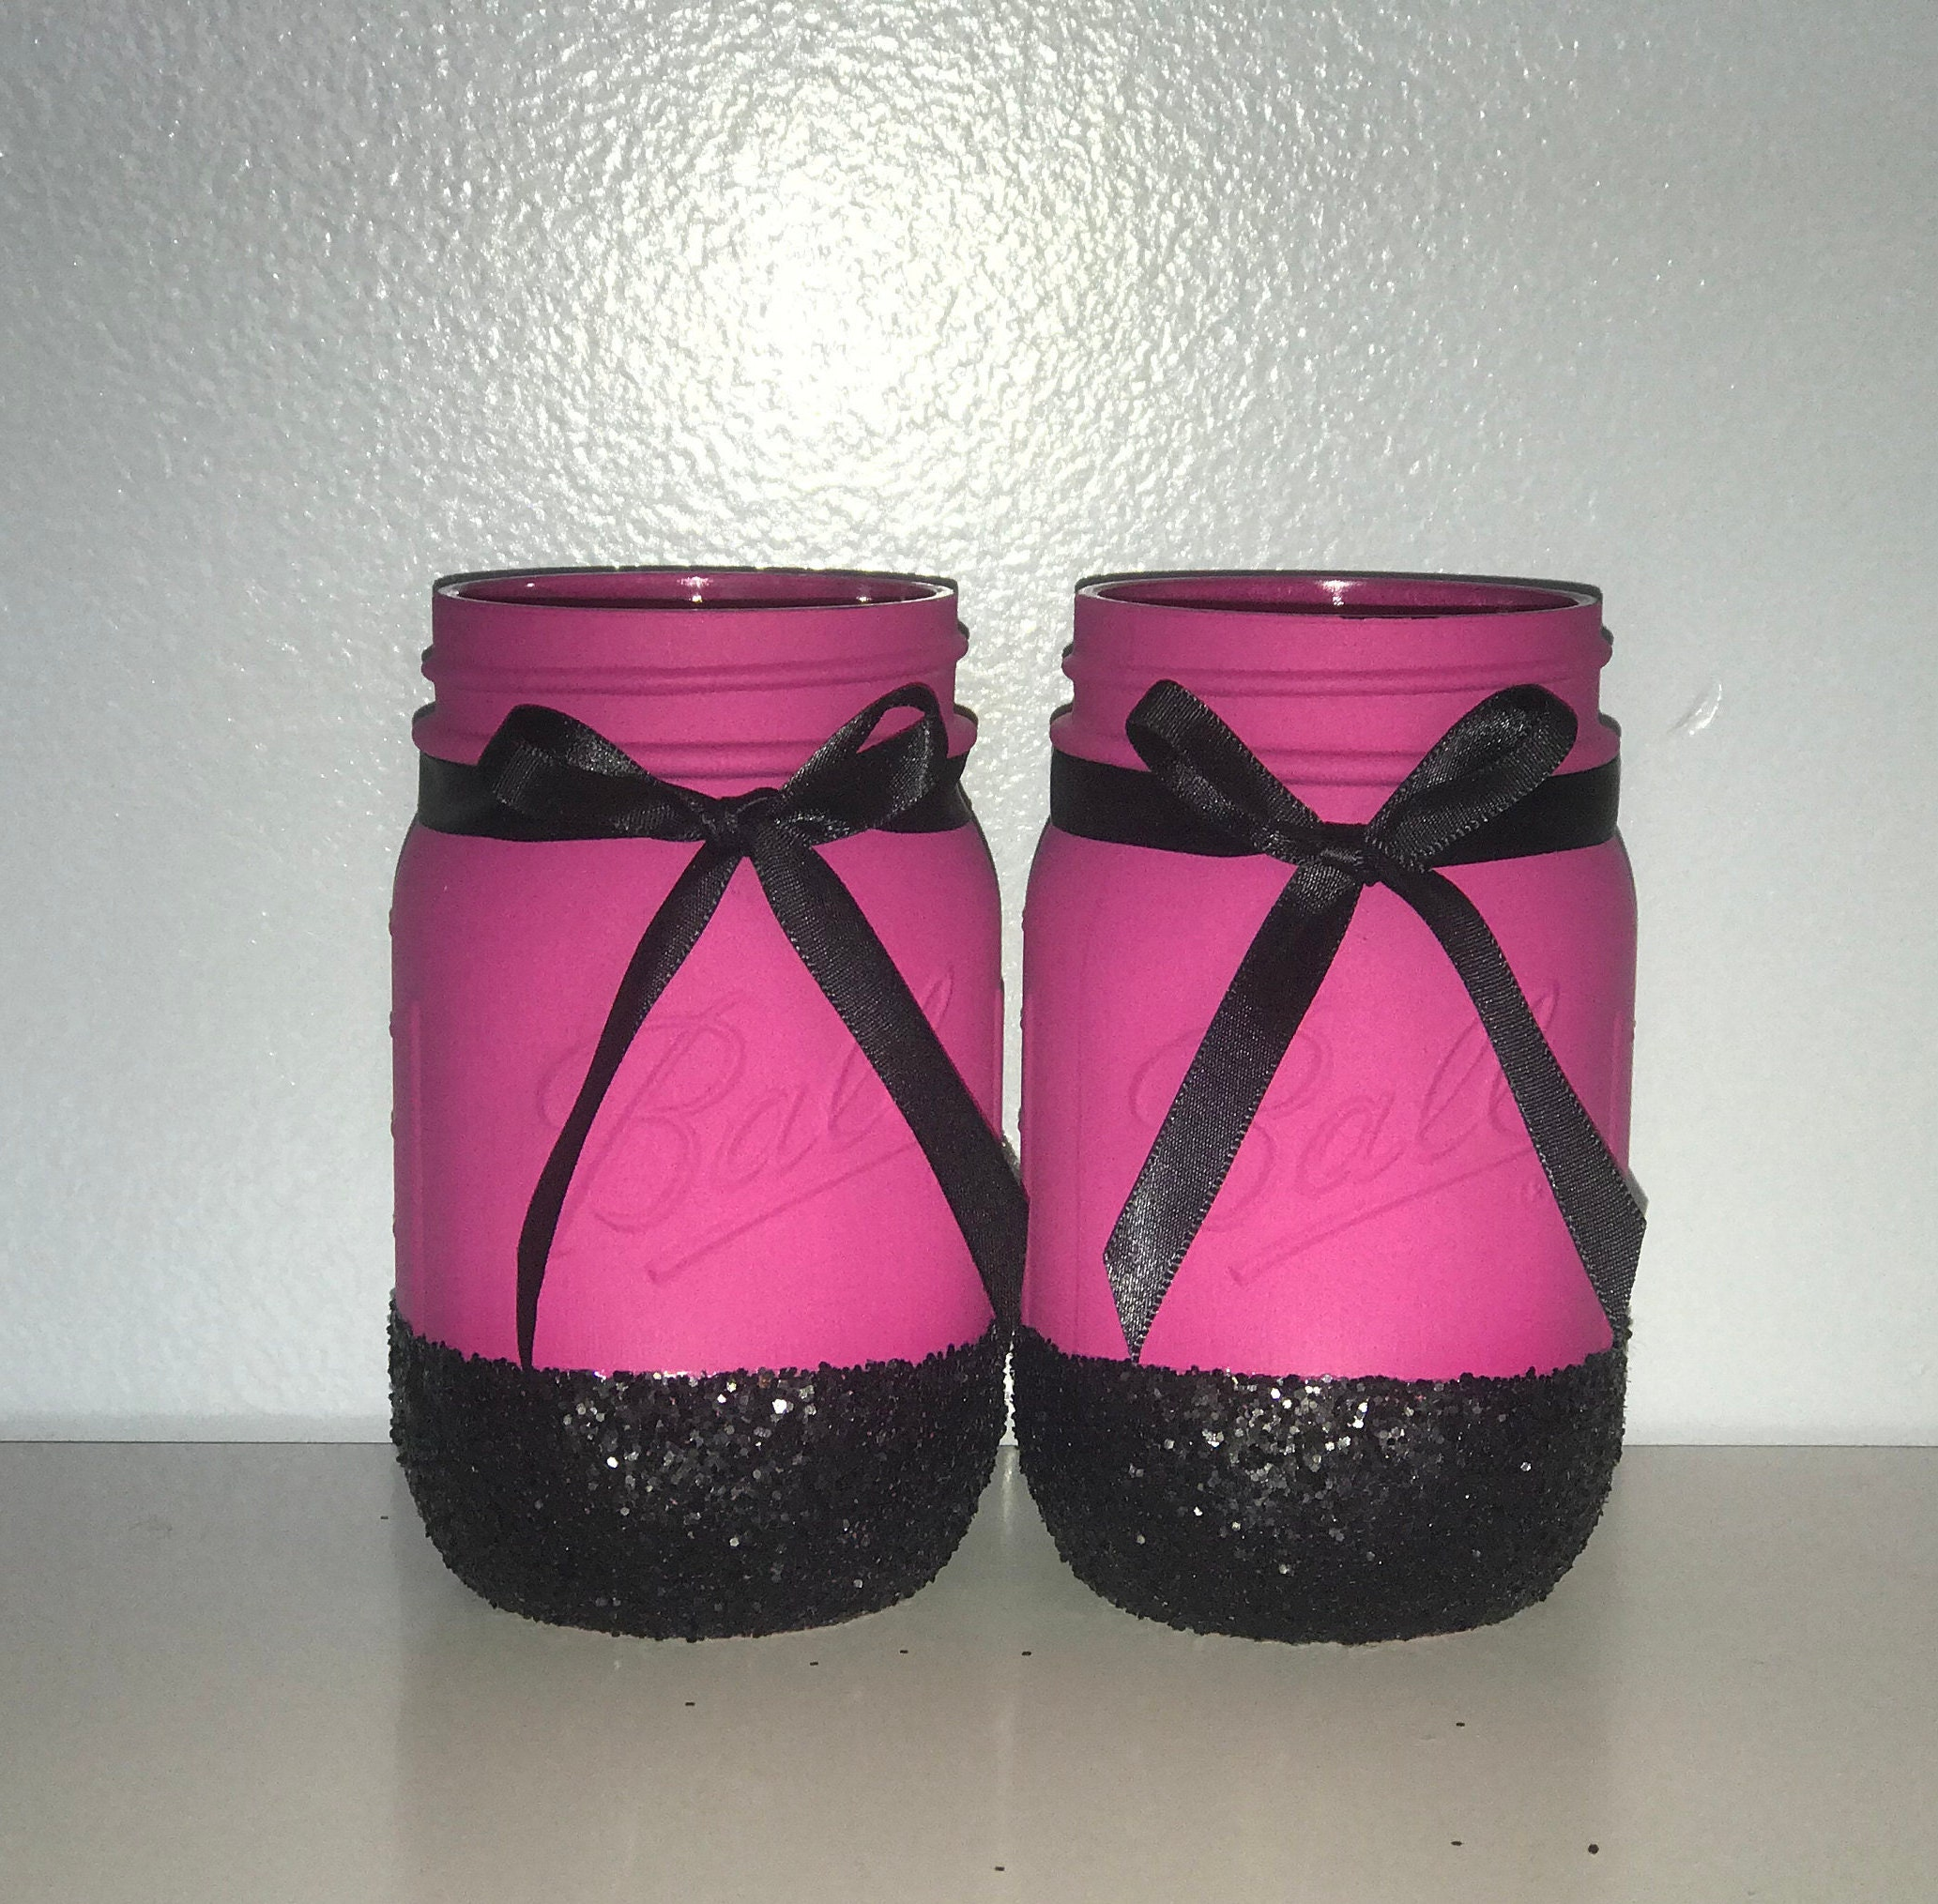 Hot Pink and Black Mason Jars Set of 2 Bachelorette Party   Etsy